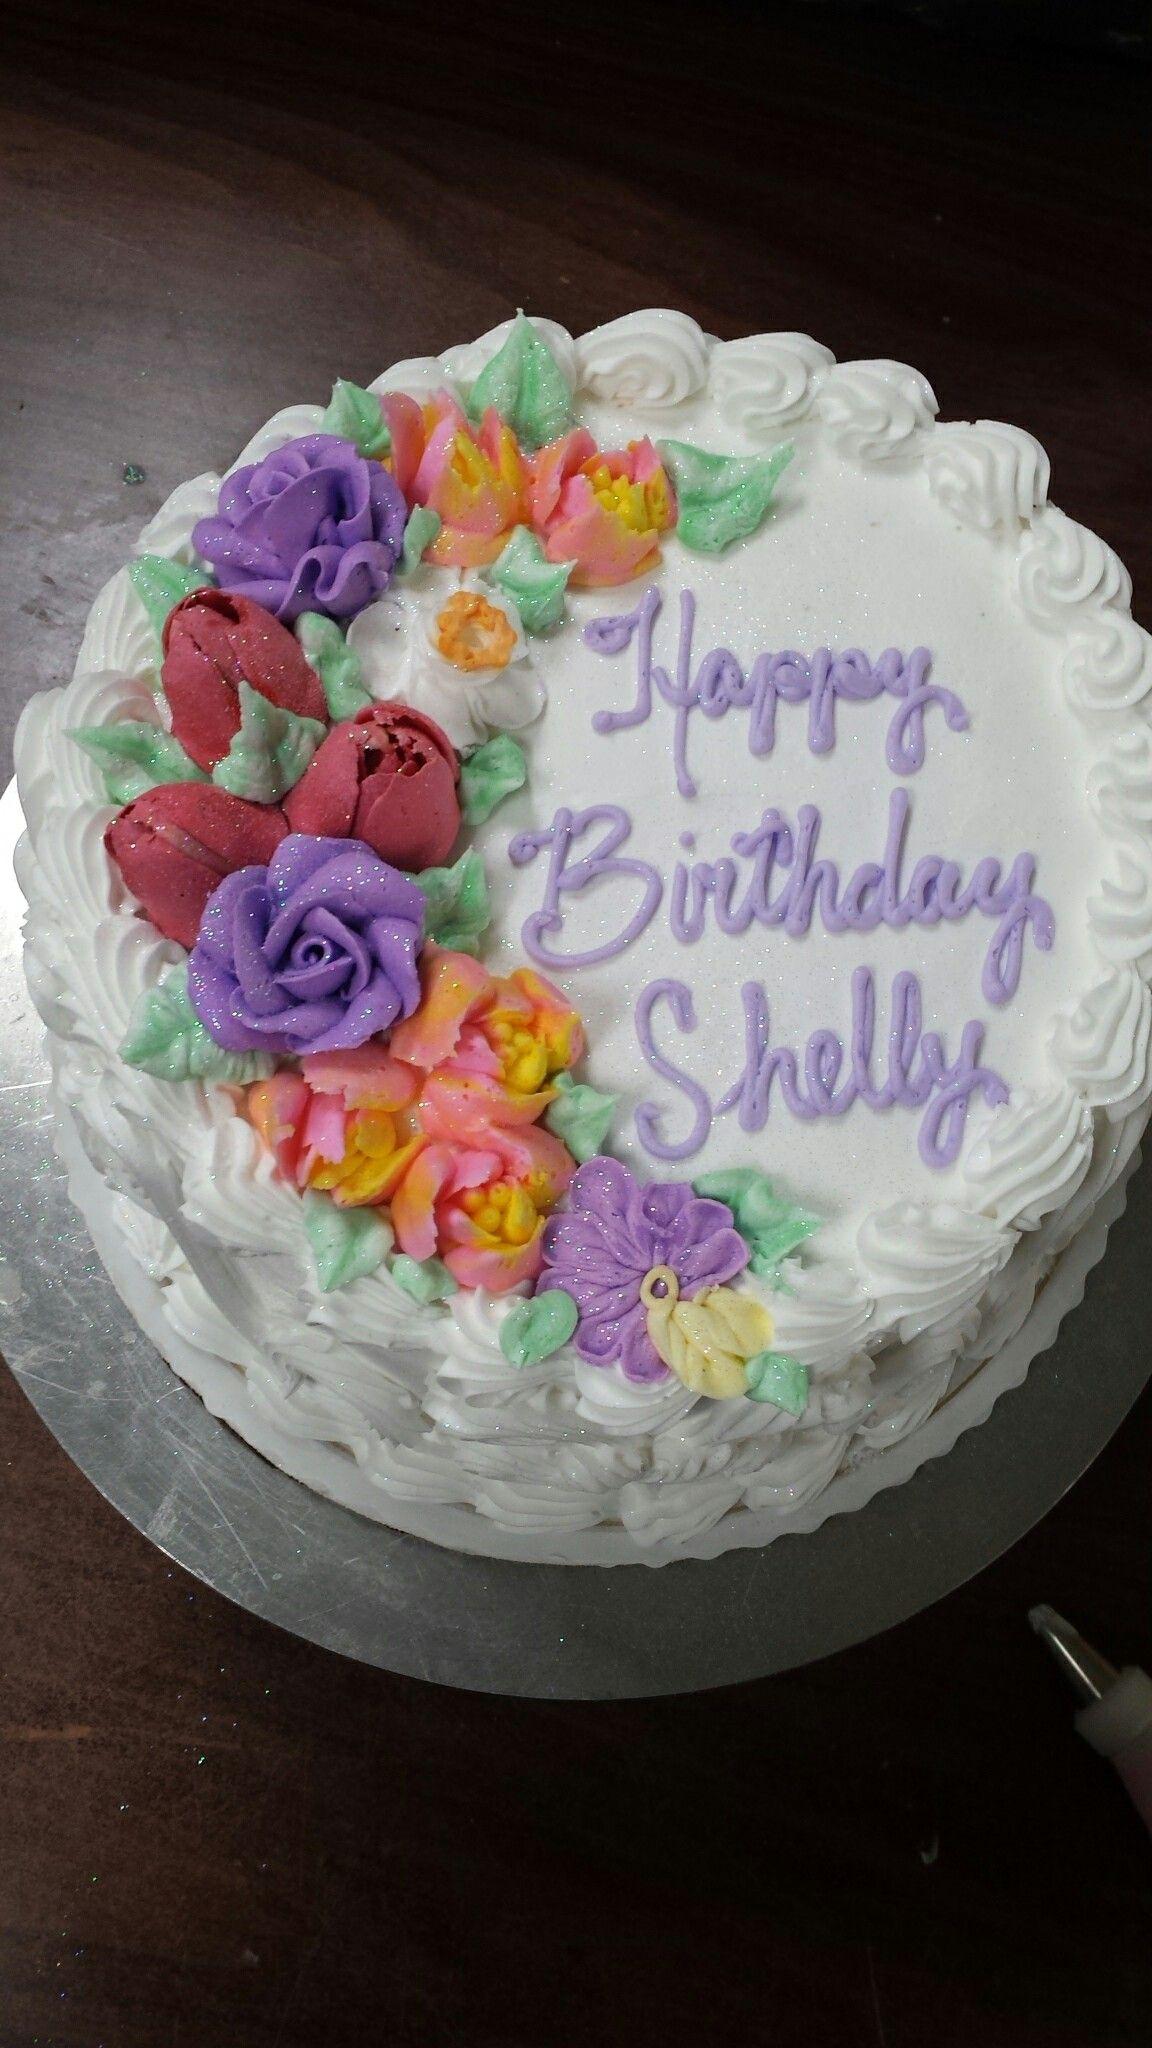 Spring flowers are the prettiest birthday cakes karens cakes kw spring flowers are the prettiest birthday cakes publicscrutiny Choice Image